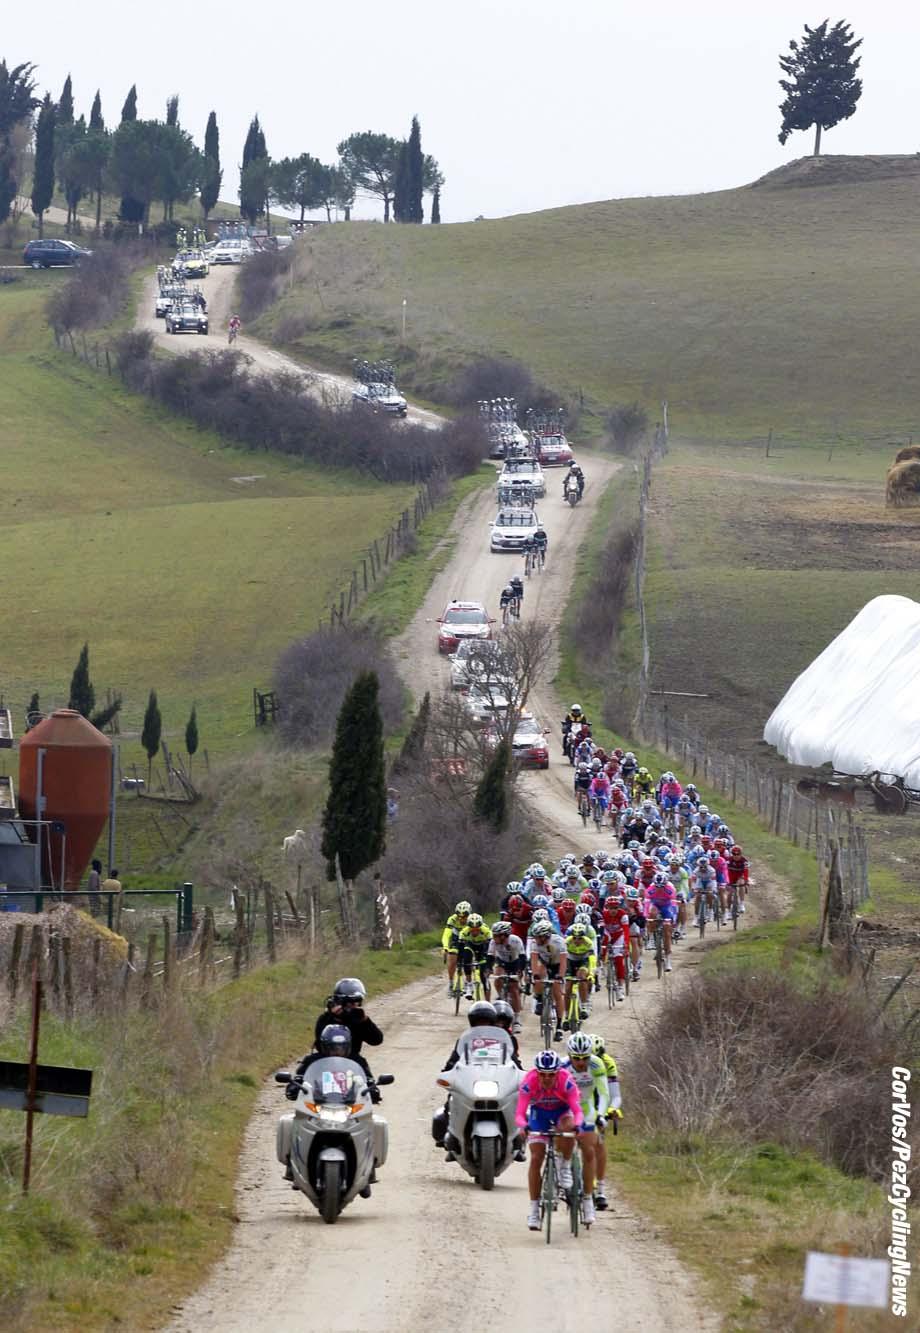 Siena - Italia - wielrennen - cycling - radsport - cyclisme - Montepaschi Strade Bianche - Eroica Toscana. -  sfeer illustratie peloton - foto Cor Vos ©2011